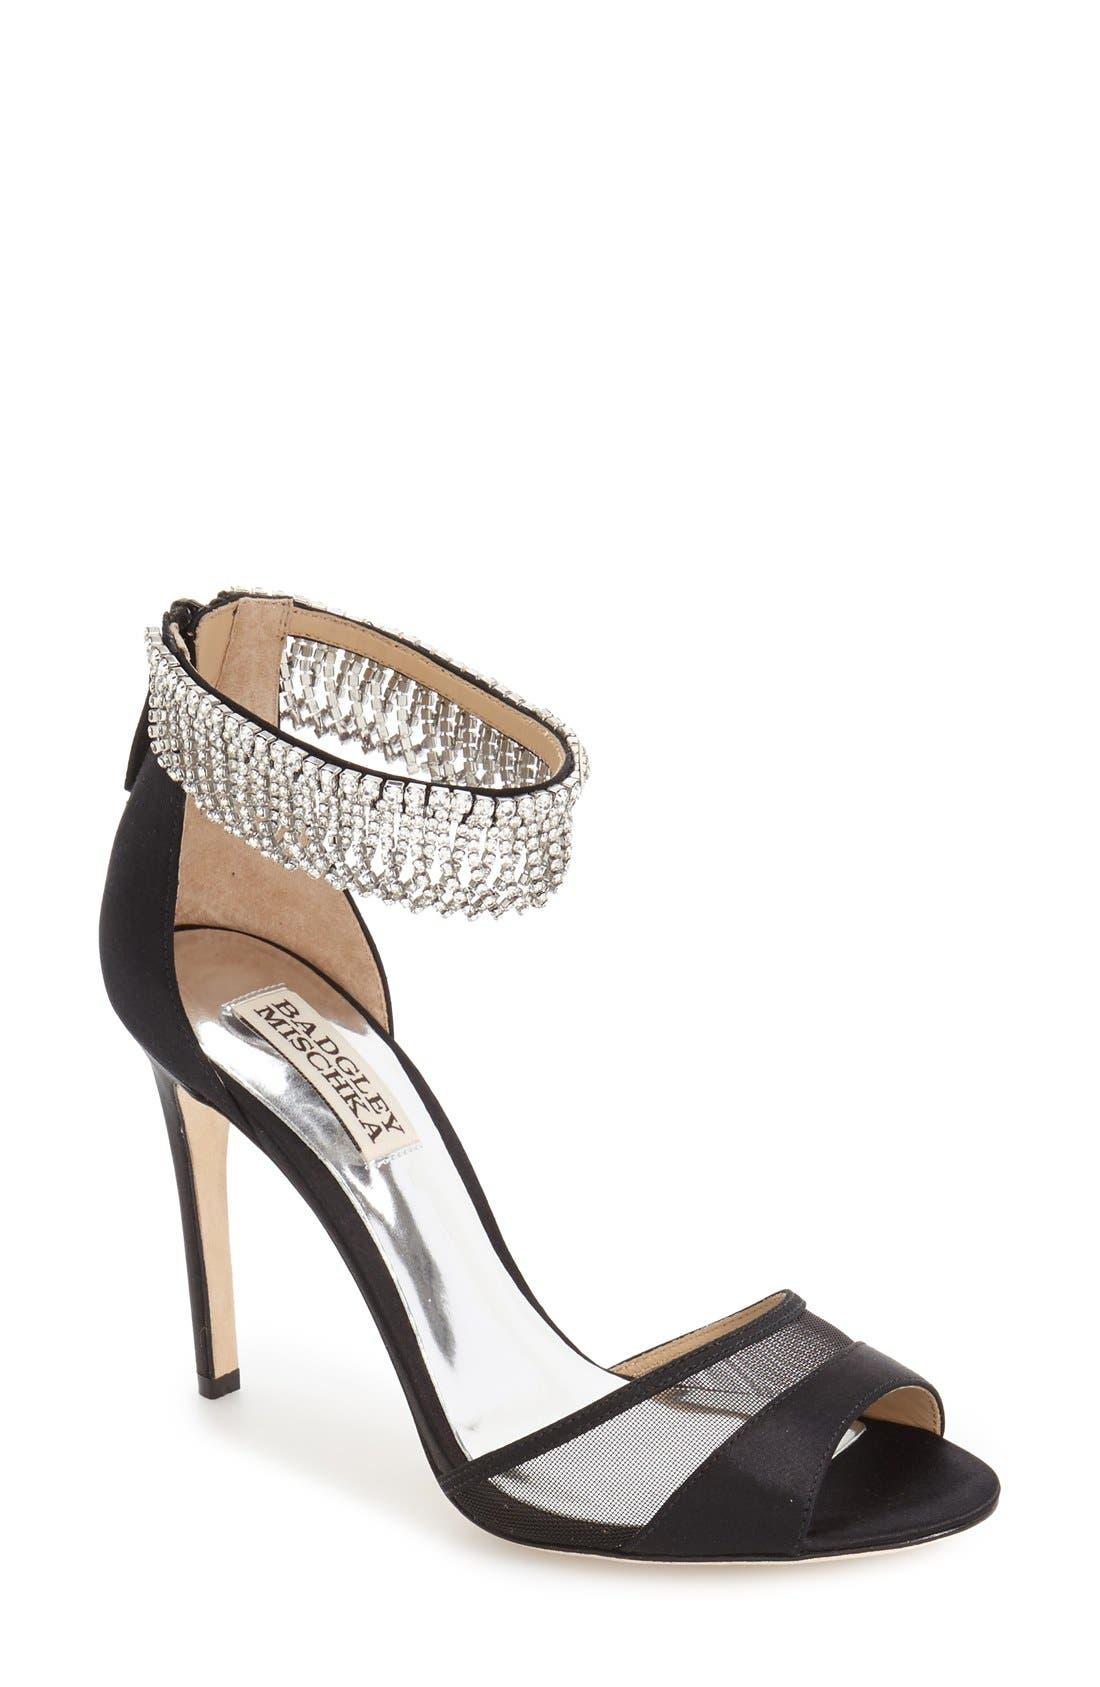 Main Image - Badgley Mischka 'Gazelle' Ankle Strap Sandal (Women)